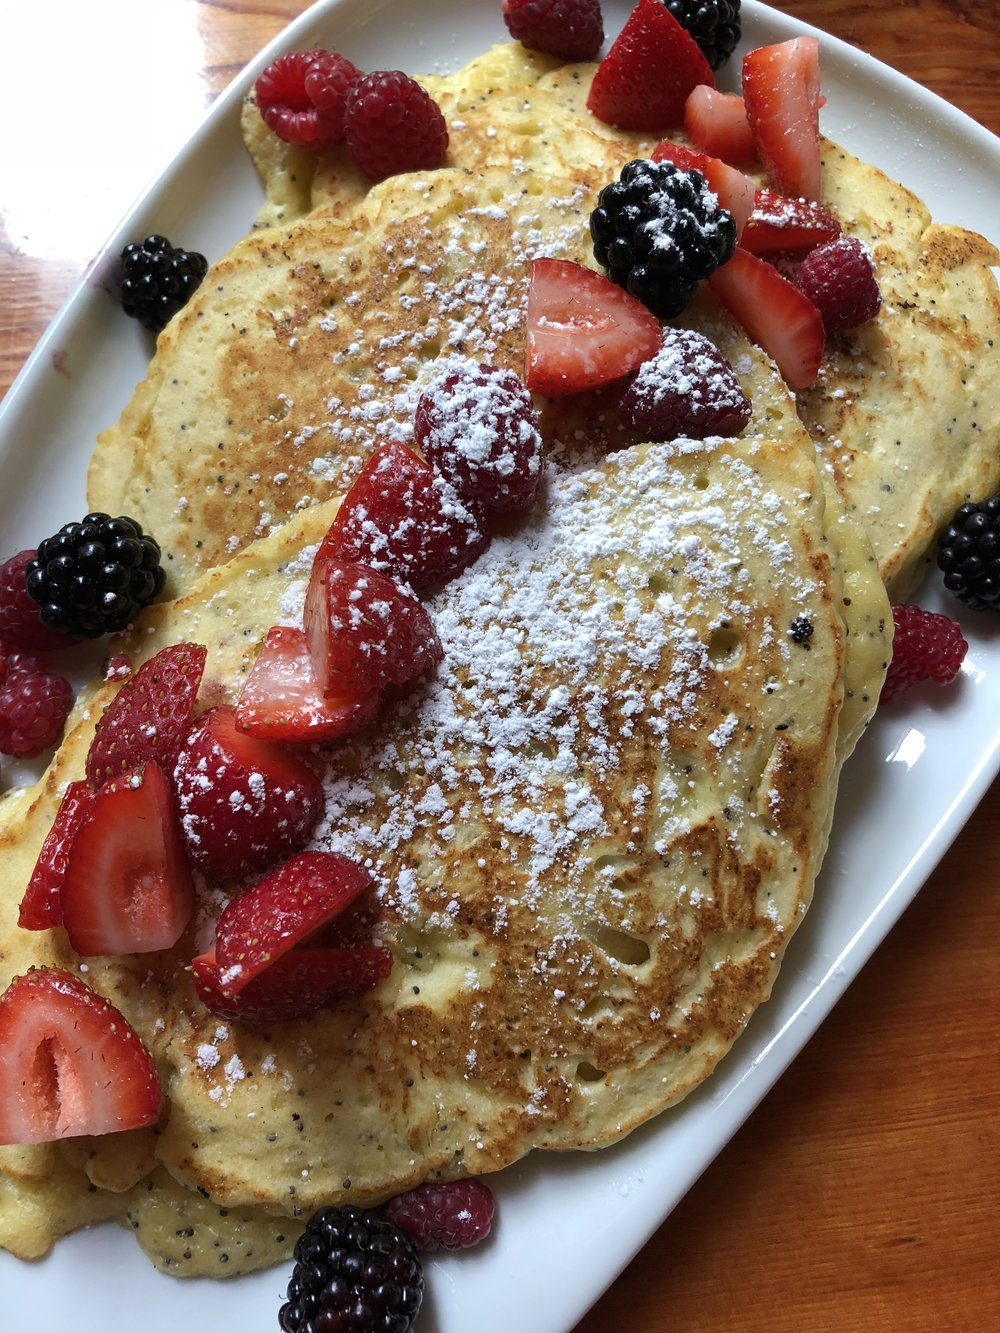 I am still dreaming about this brunch: Lemon Ricotta & Poppyseed Pancakes